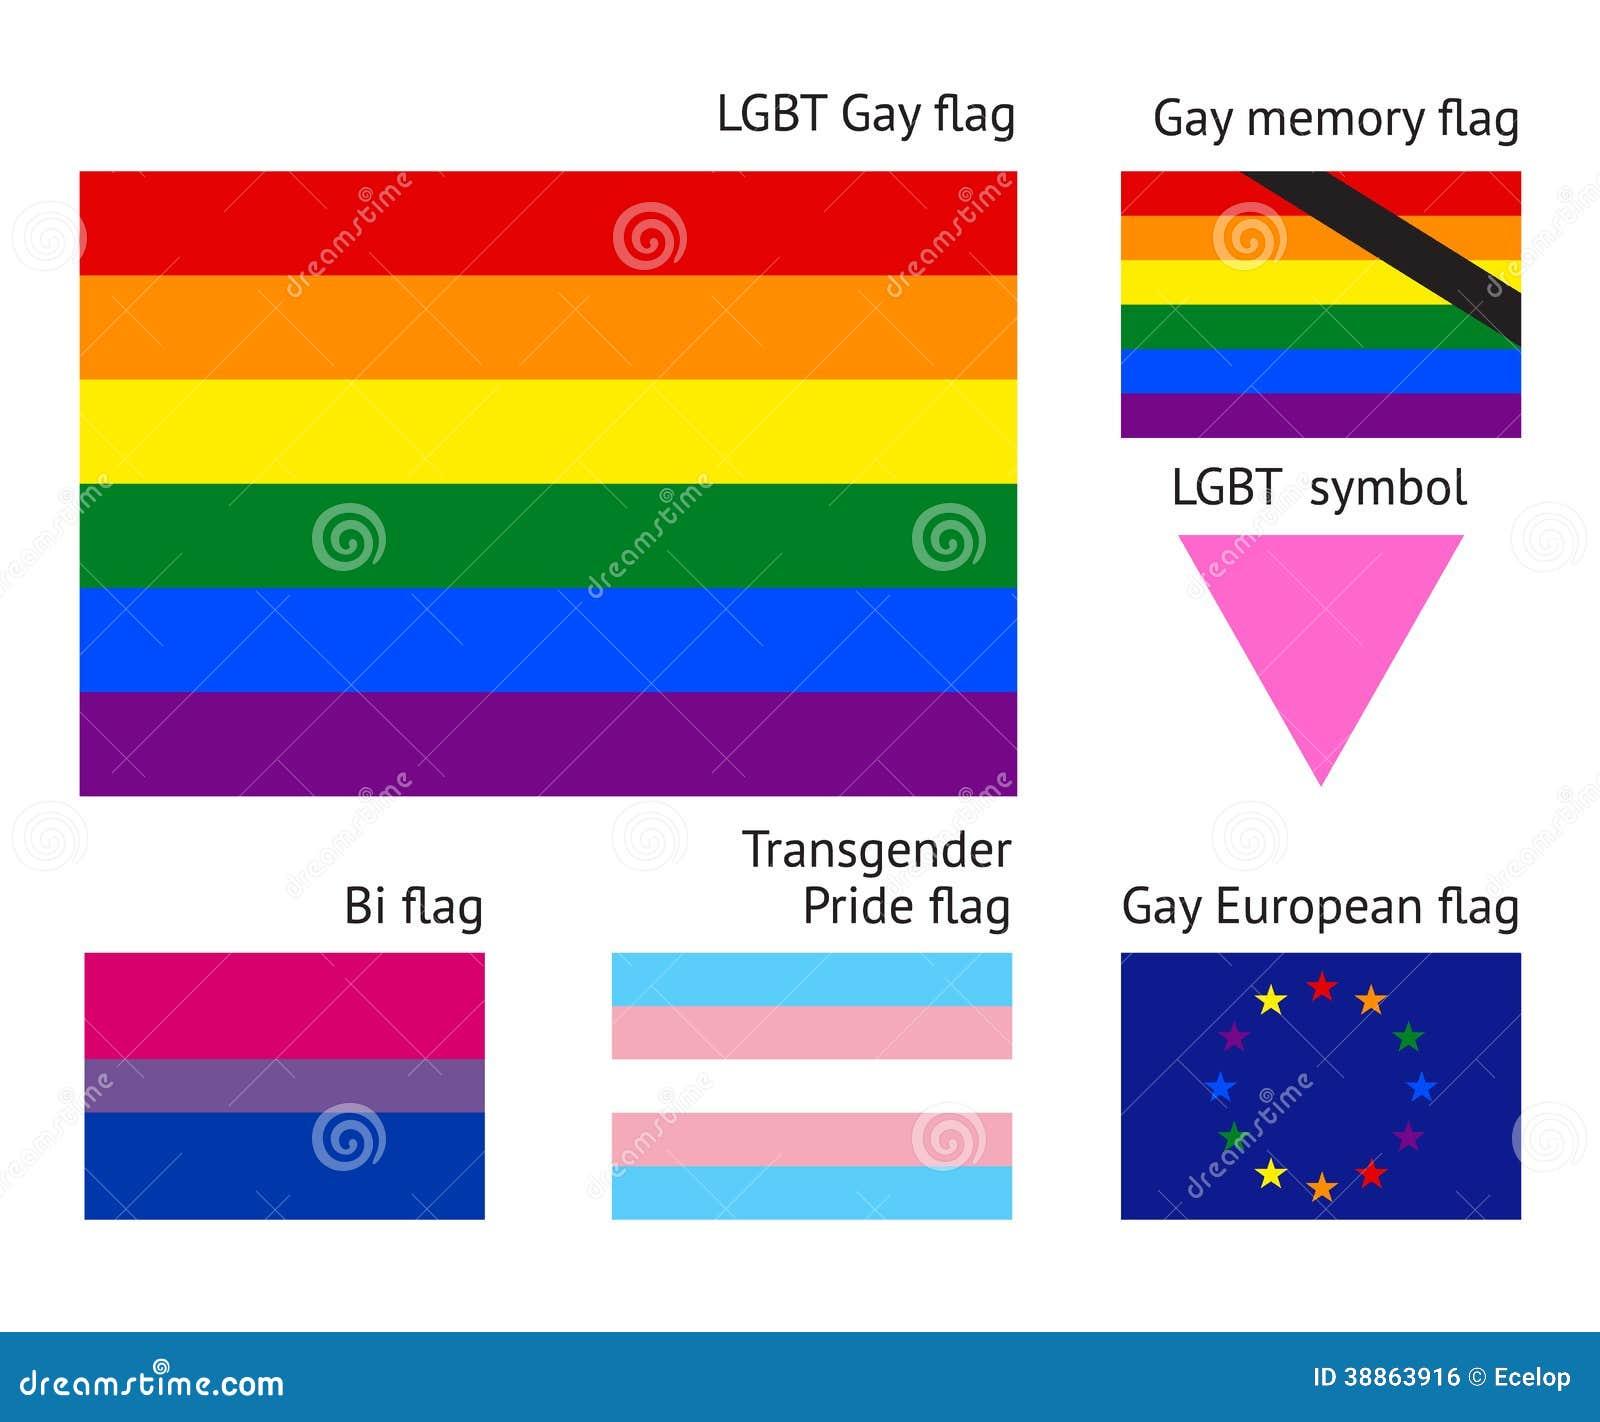 Bisexual female graphics